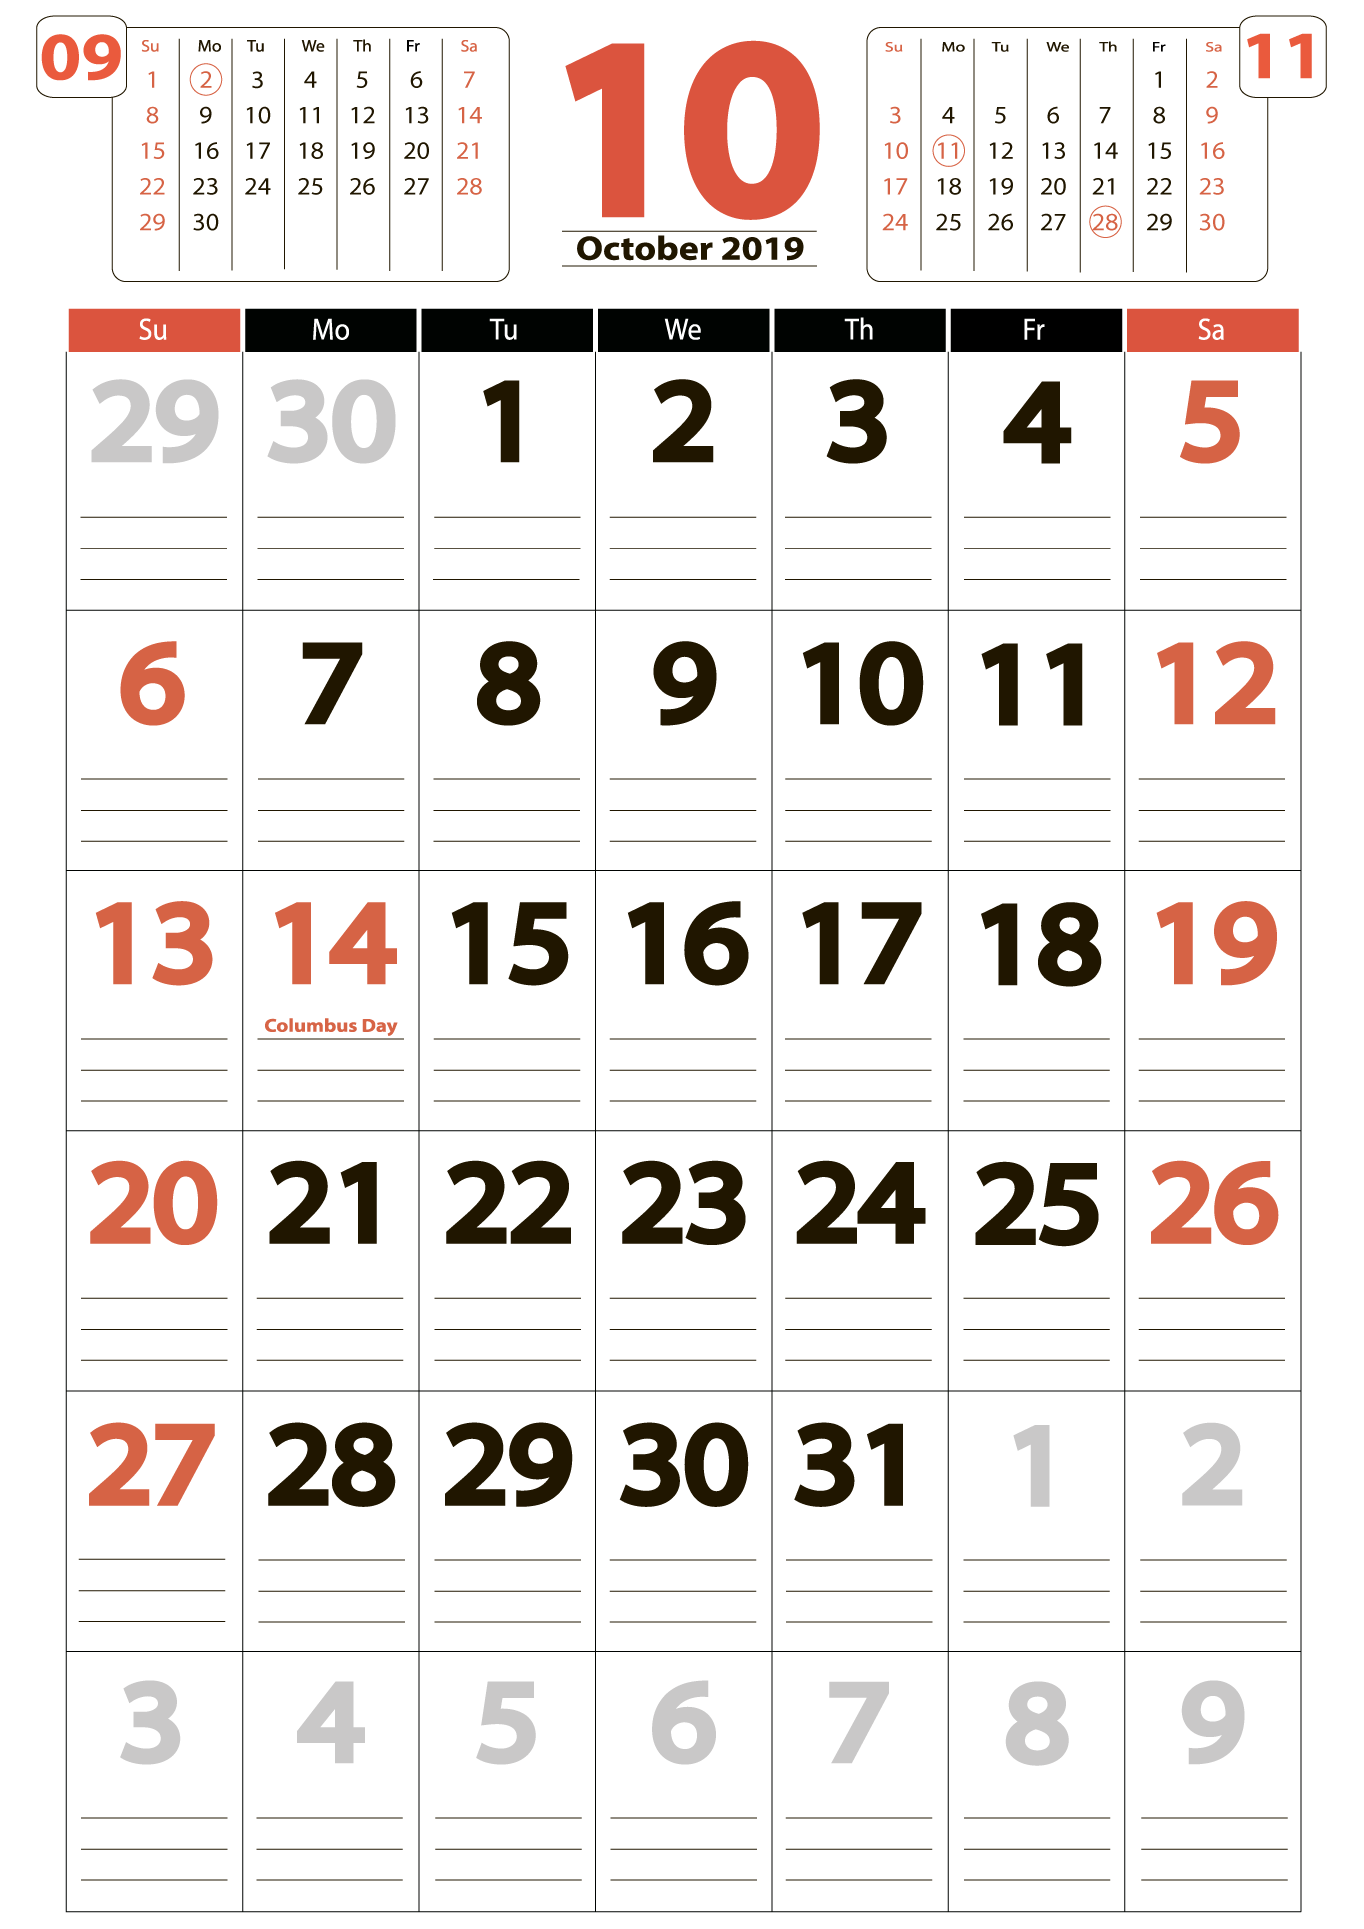 October 2019 calendar  portrait